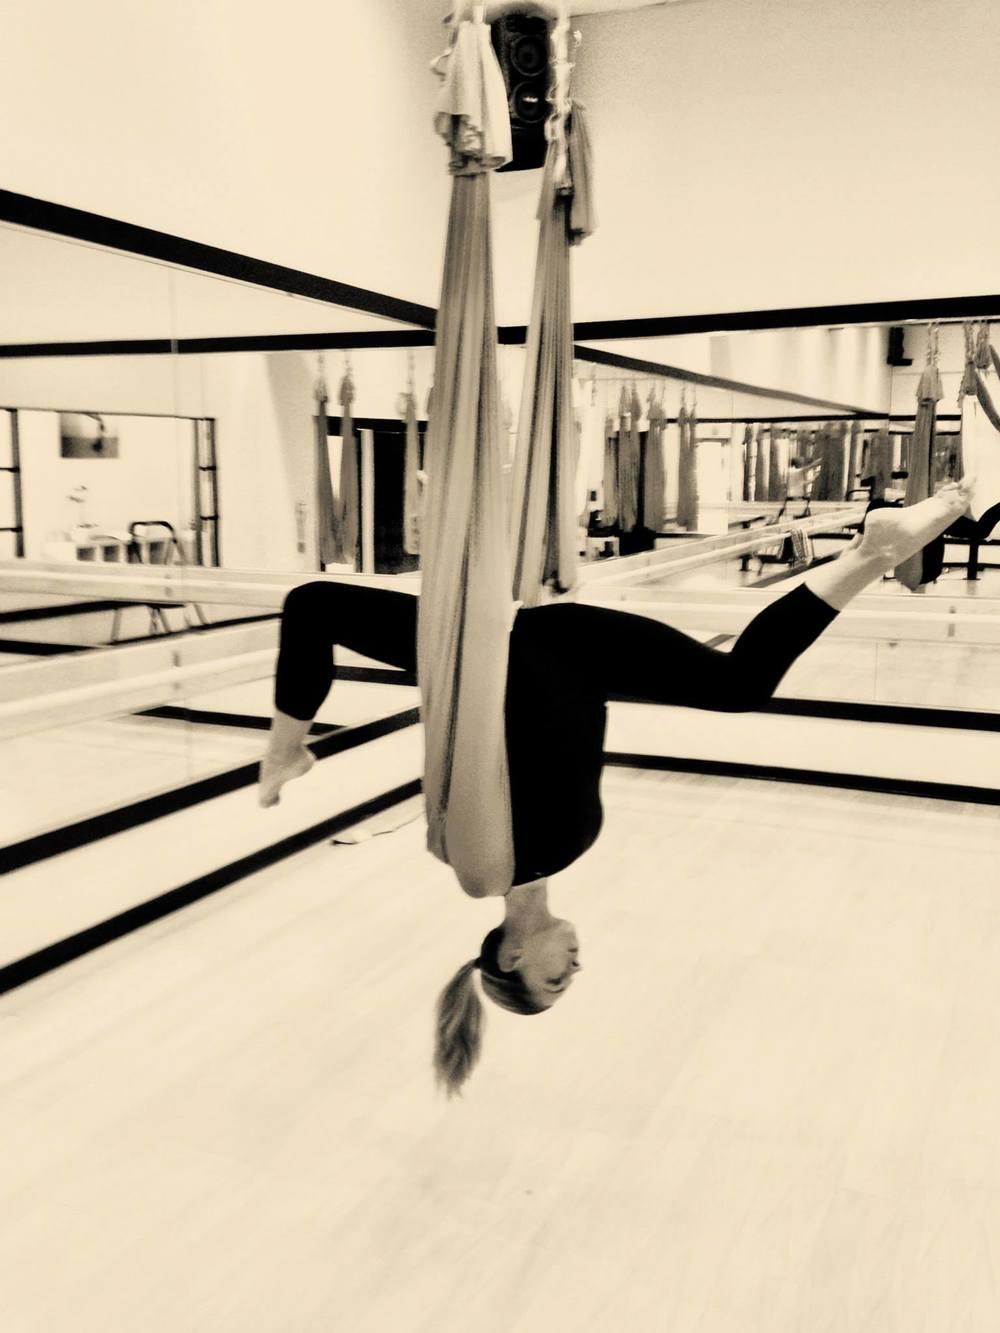 21 August 2013. Calabasas, CA. Anti-gravity fitness.